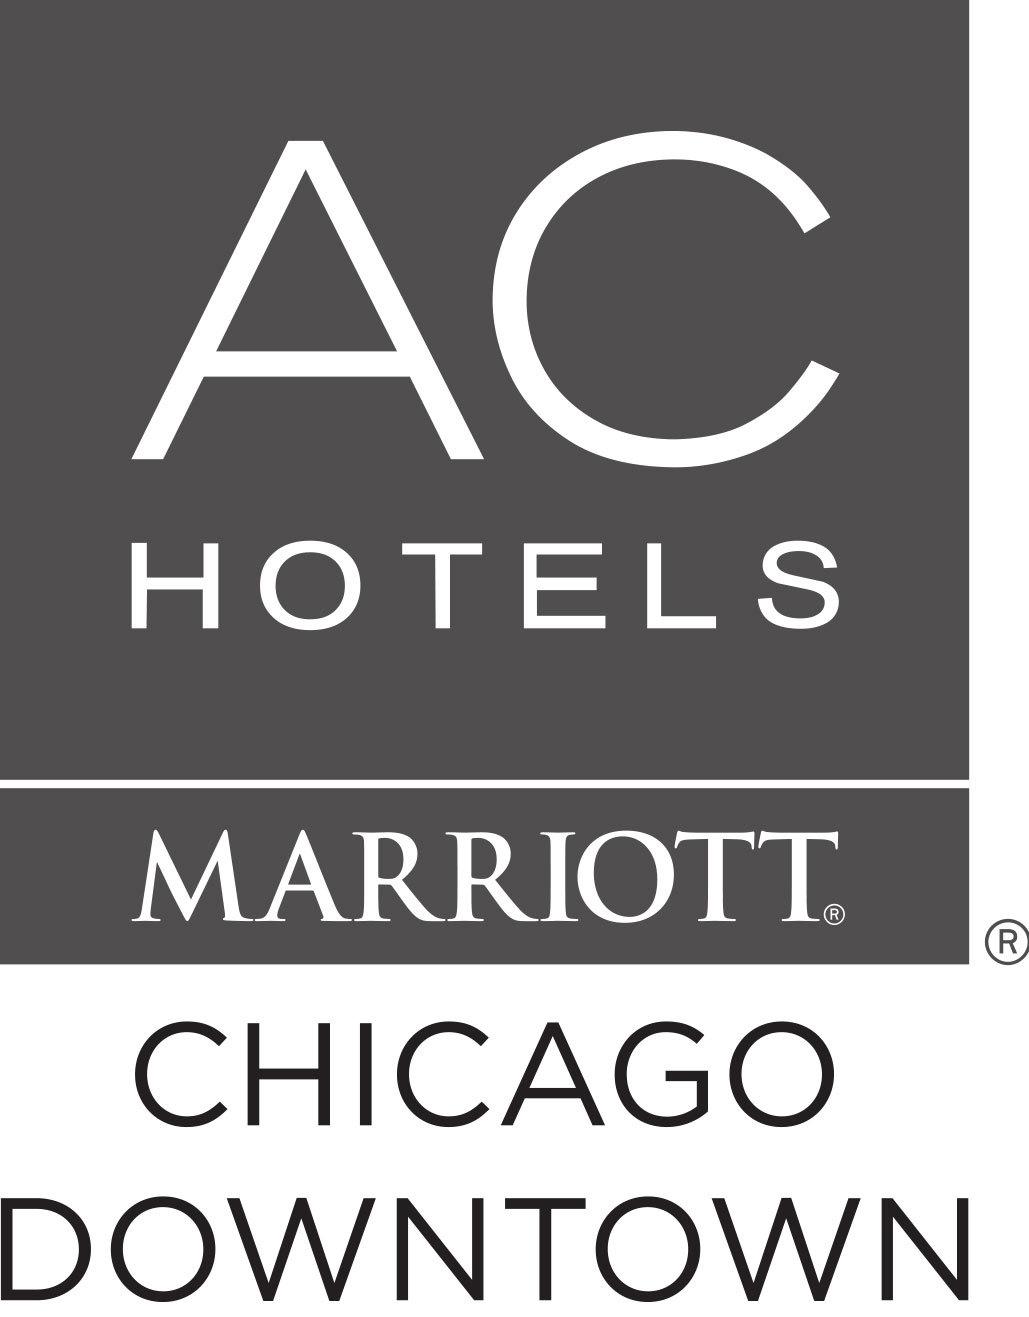 Marriott Ac Hotel Chicago Downtown Names Sara Davis Zapata General